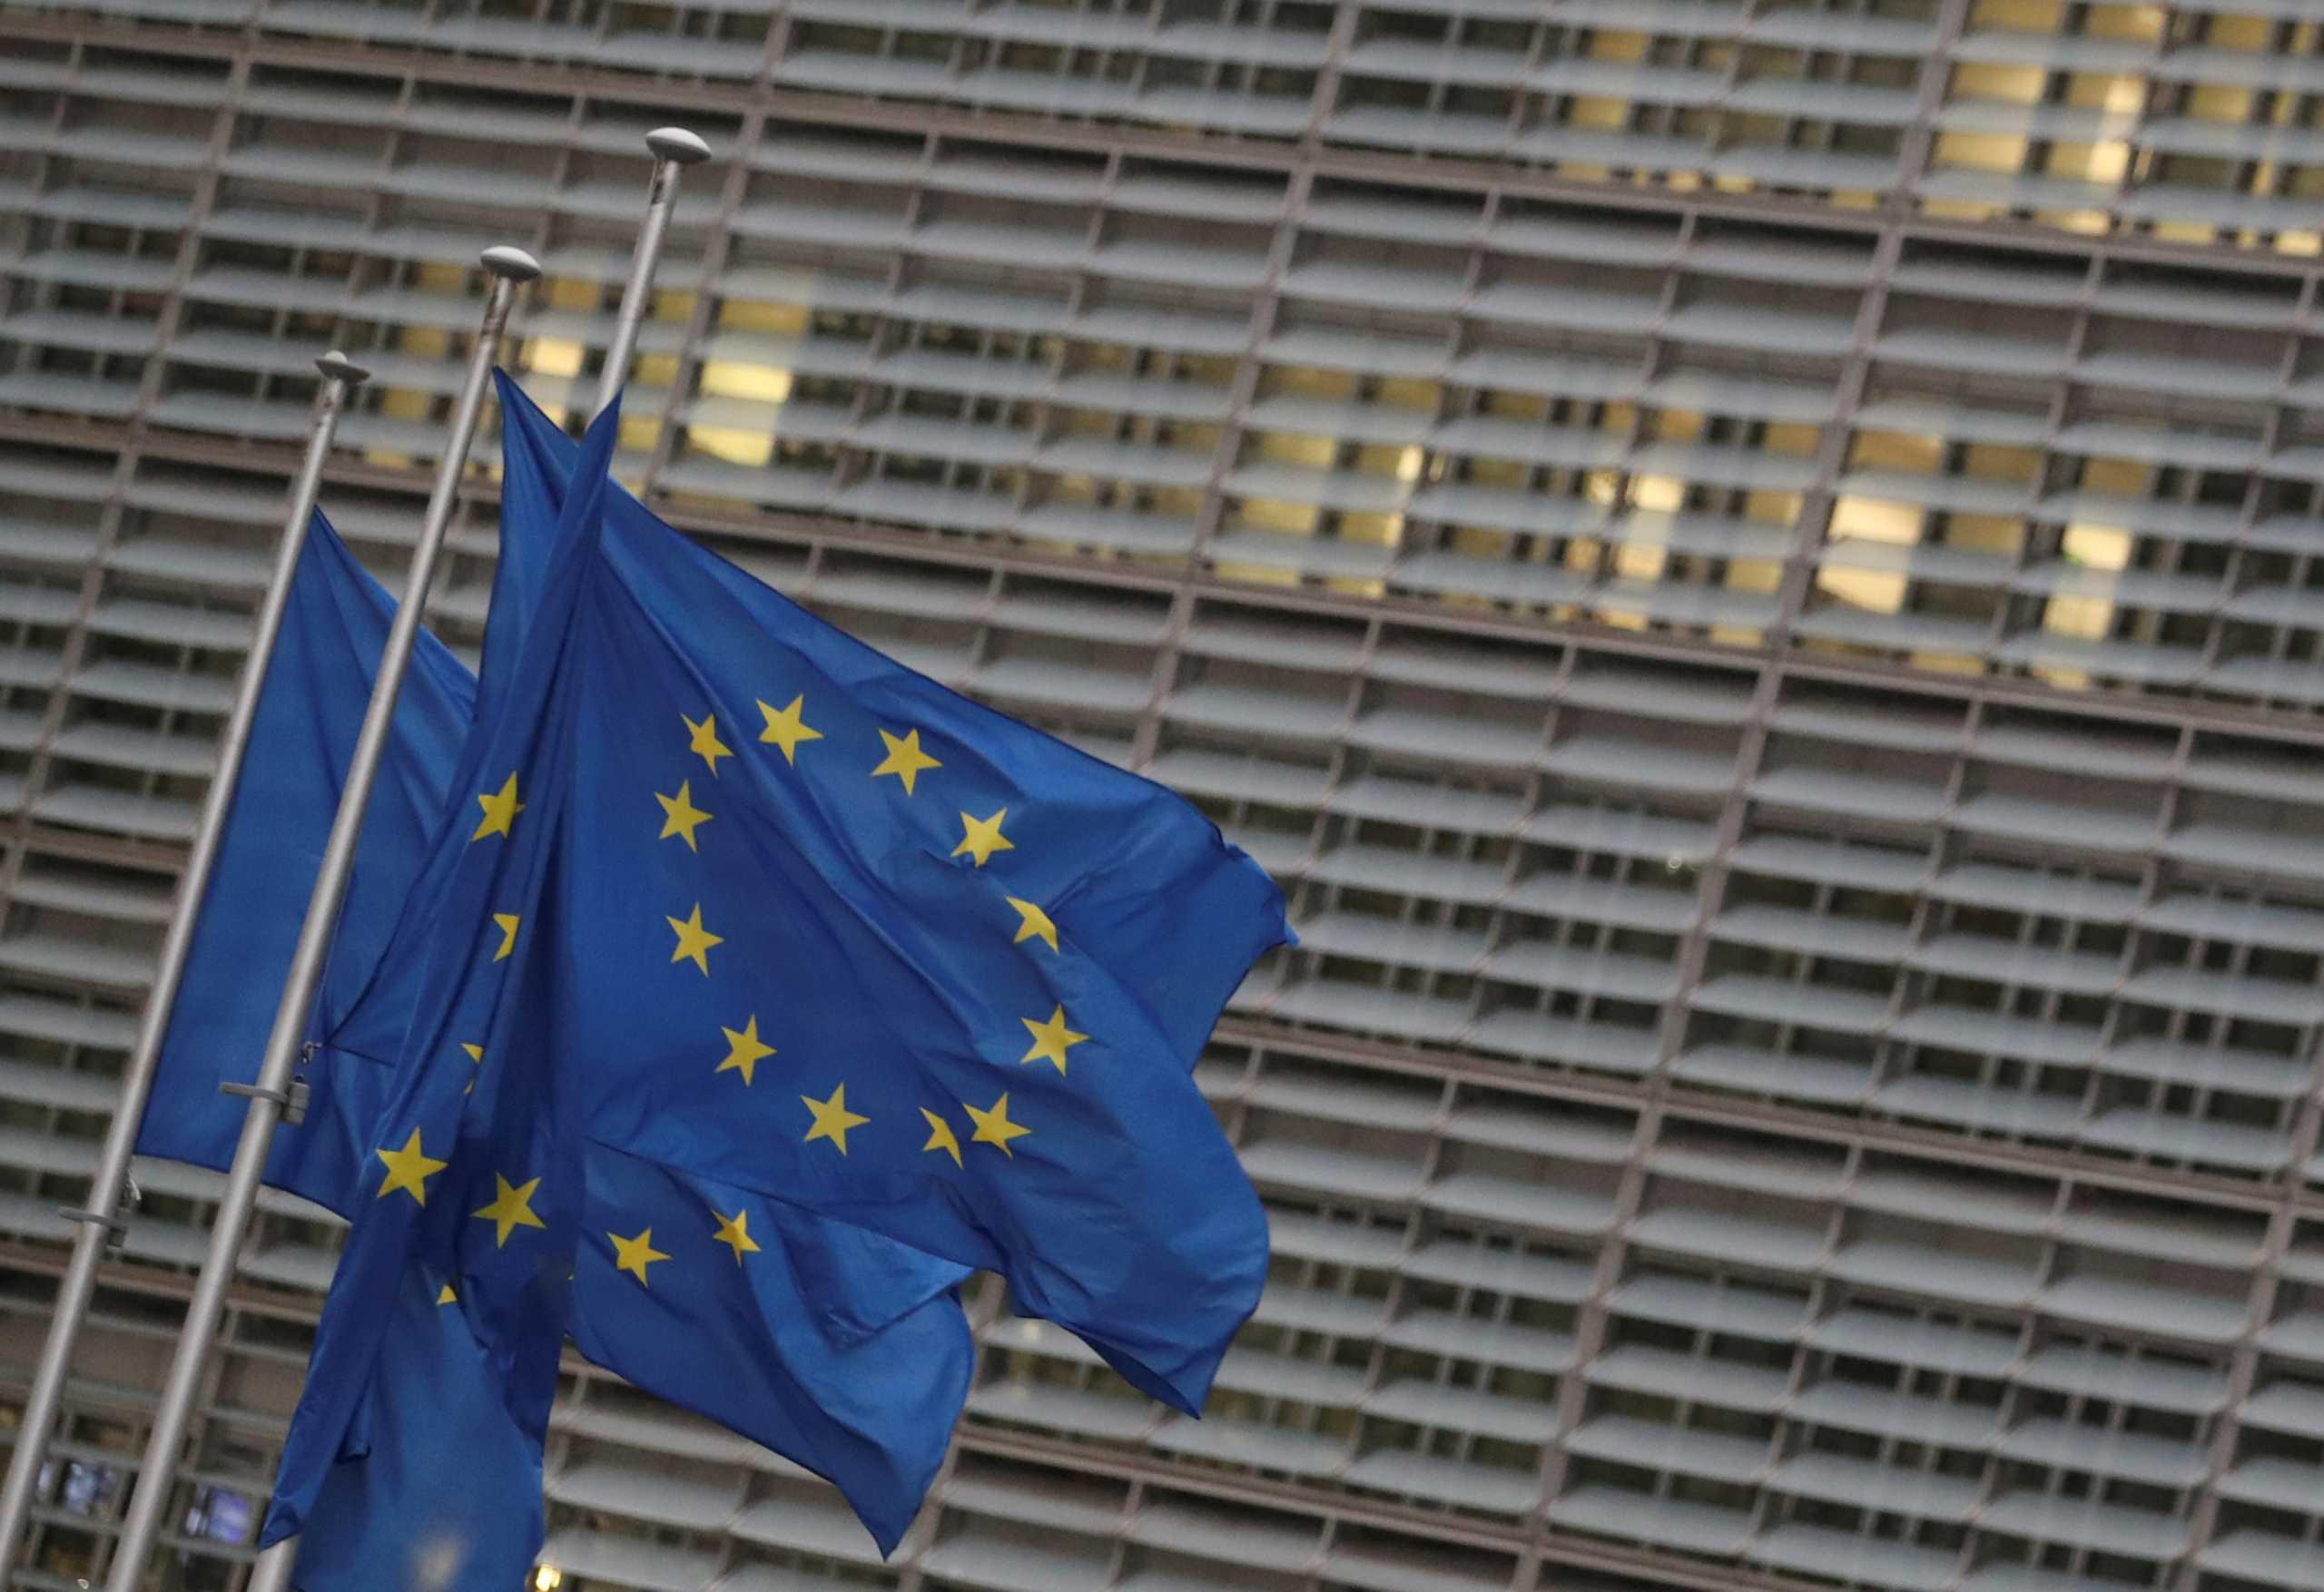 Brexit: Με το δάχτυλο στην «σκανδάλη» η Ε.Ε – «Η υπομονή έχει και τα όρια της»